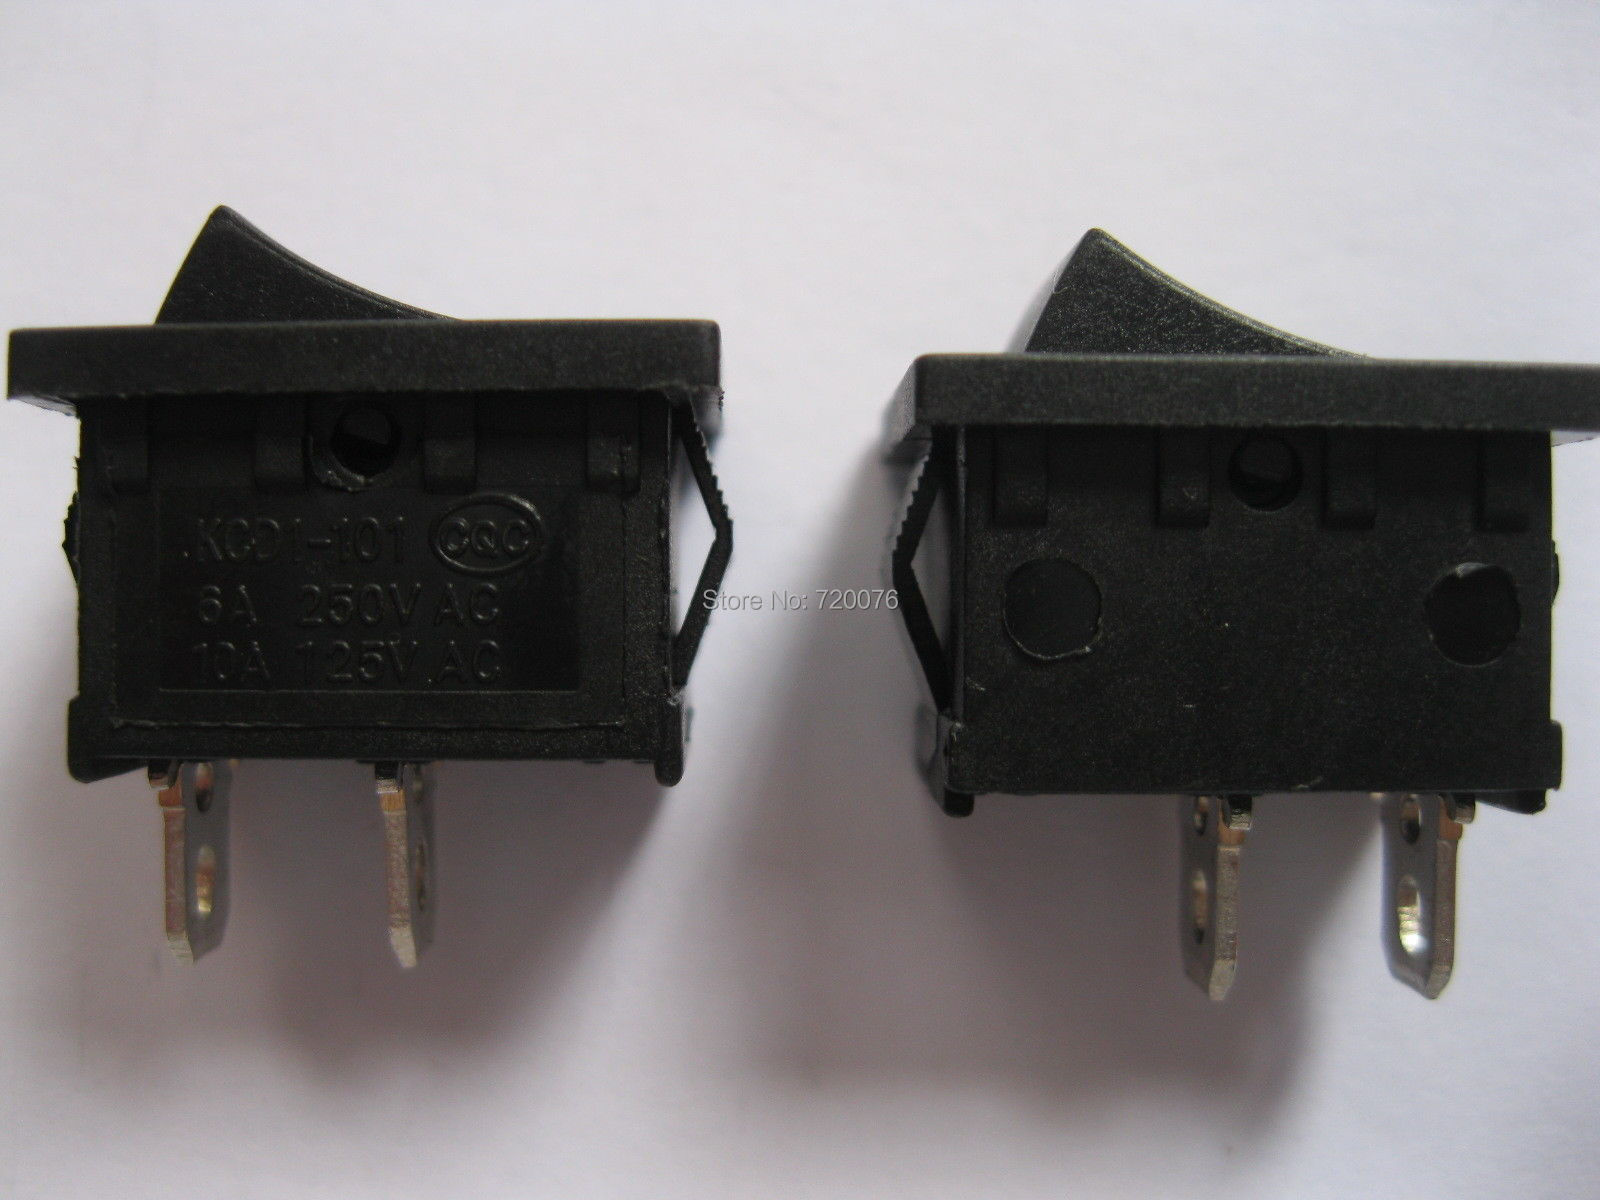 30 pcs Rocker Switch KCD1-101 ON/OFF Black Cap 2pin 6A 10A 21x15mm 30 pcs black on off dpdt rocker switch kcd3 6 terminal